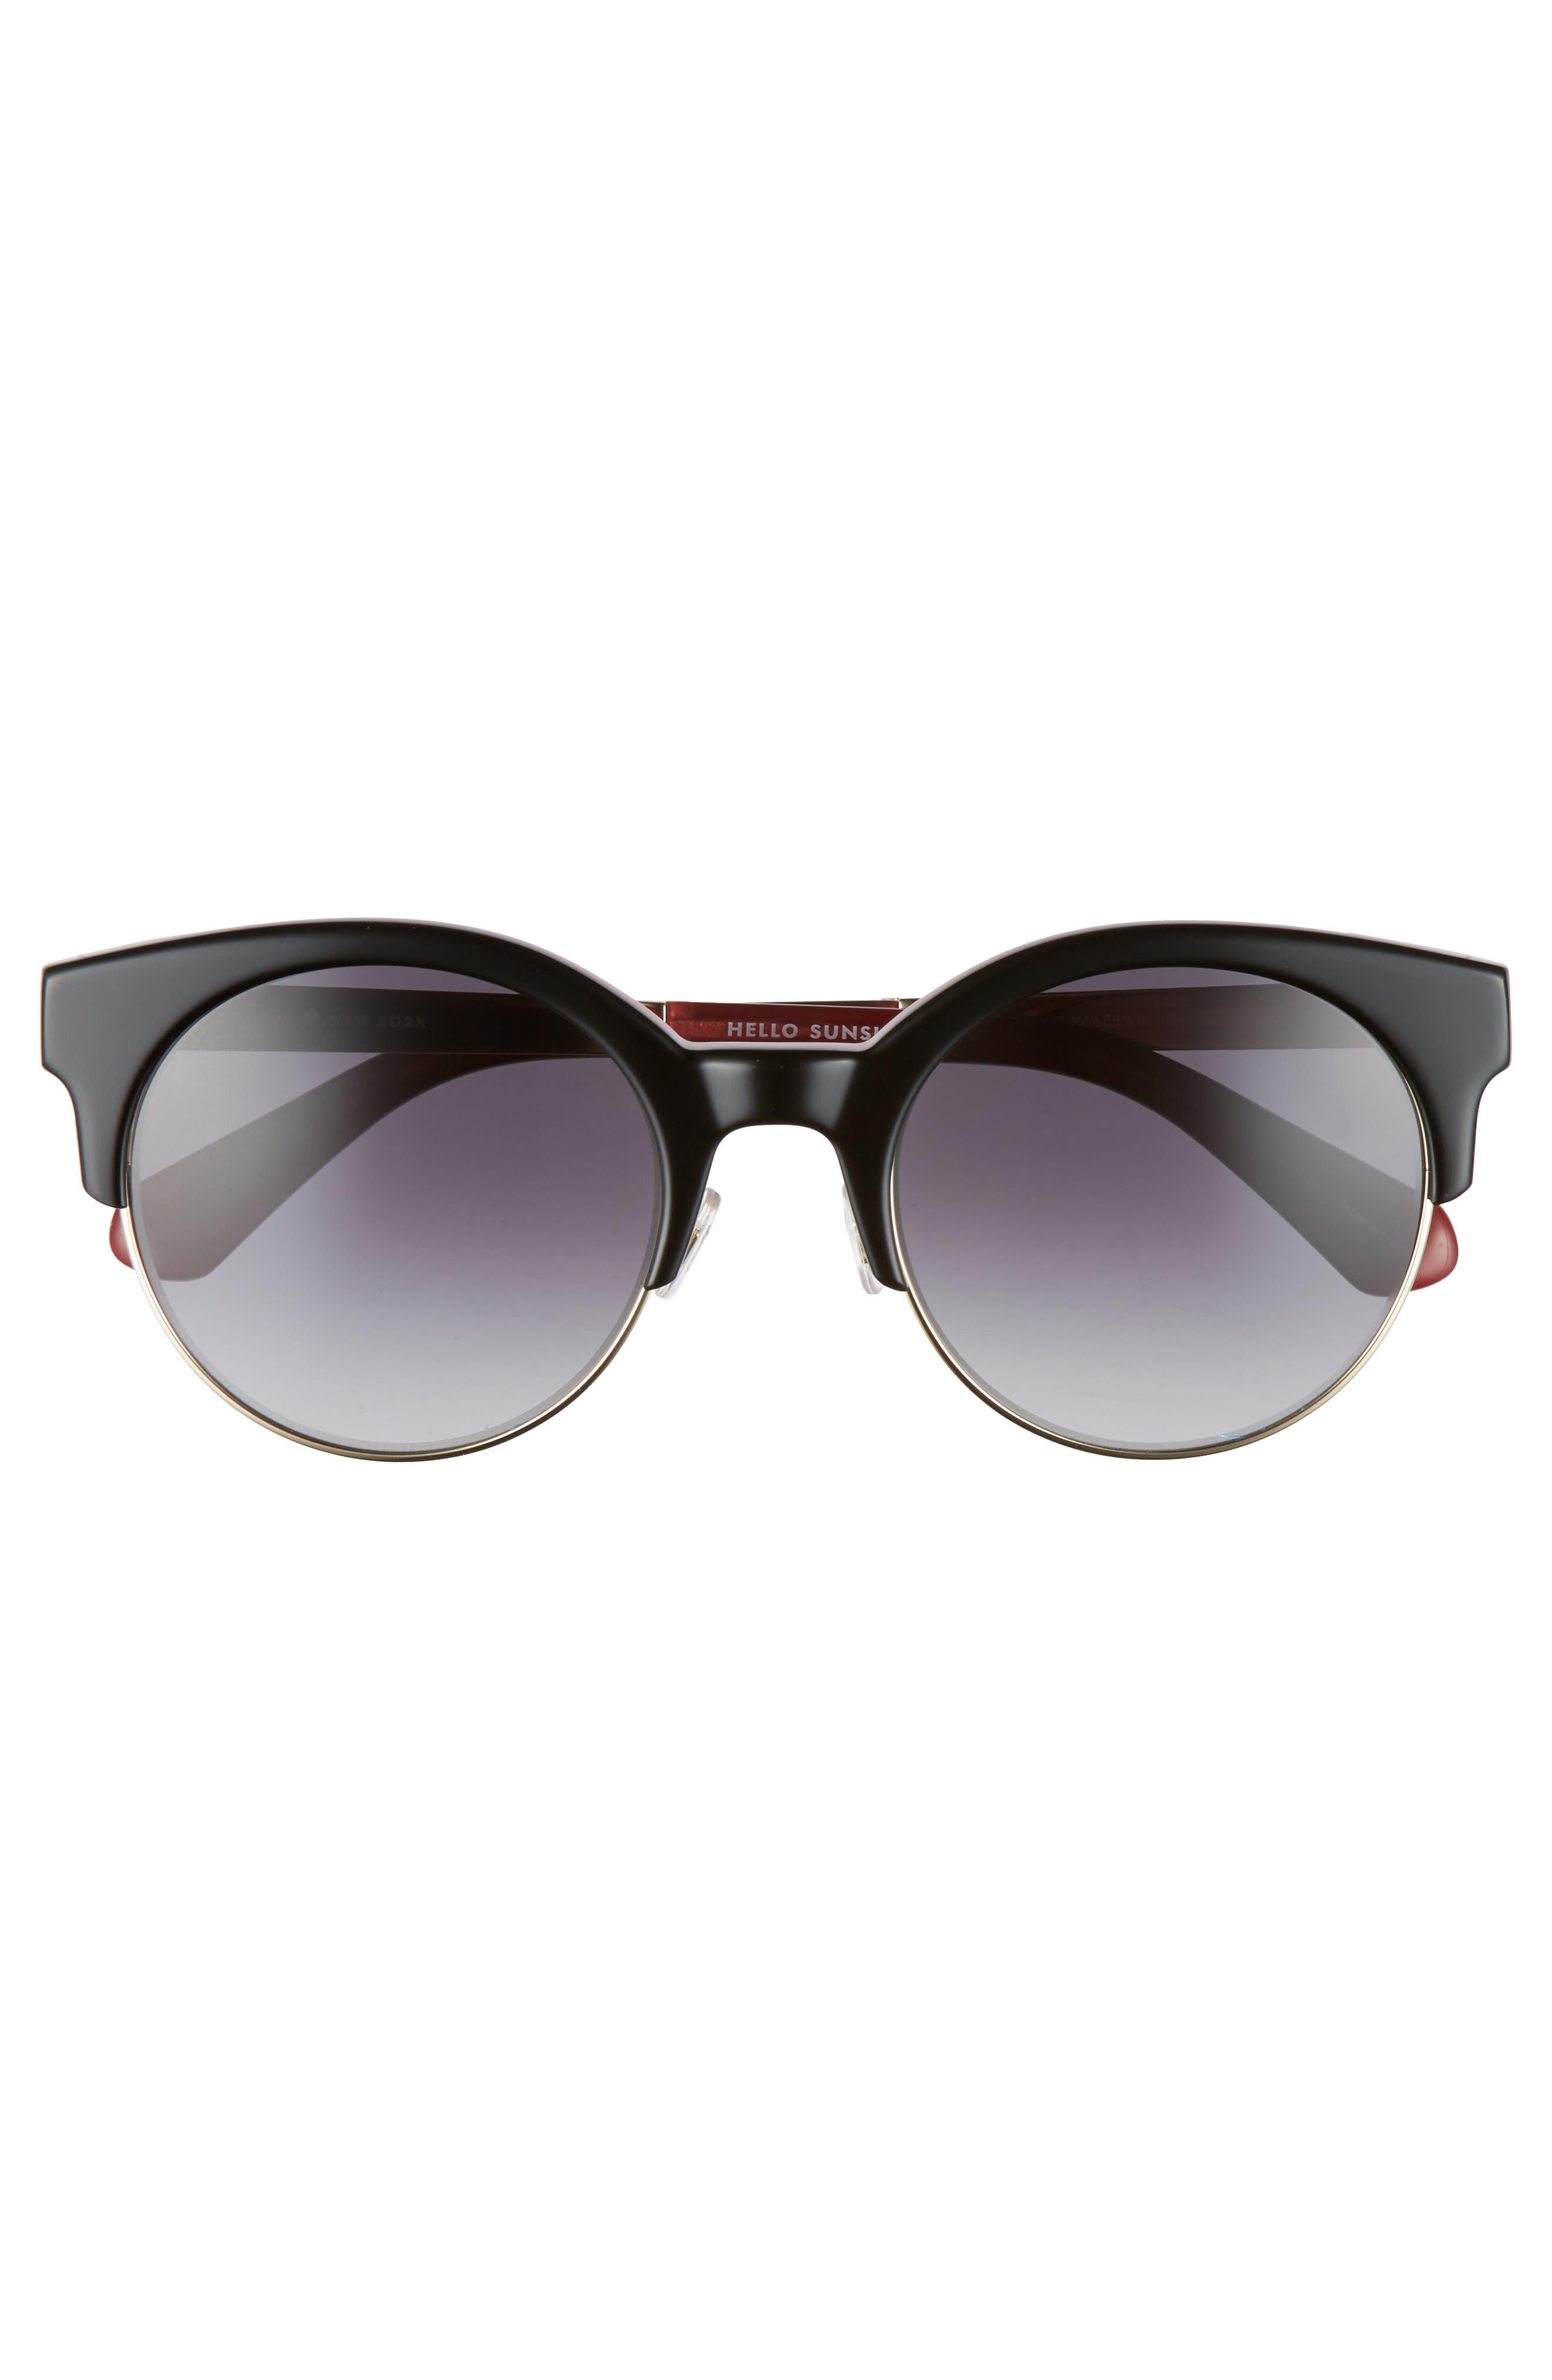 kaileen 52mm semi-rimless cat eye sunglasses,                             Alternate thumbnail 3, color,                             001